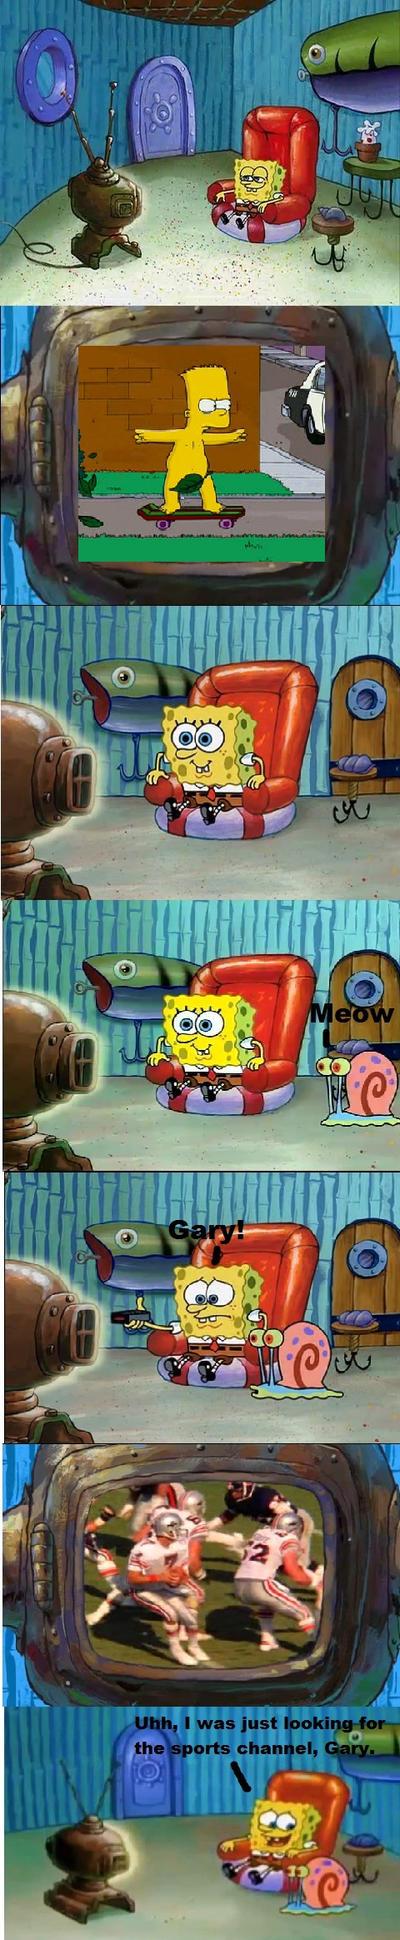 SpongeBob watching Bart Skateboarding Naked by MarcosPower1996